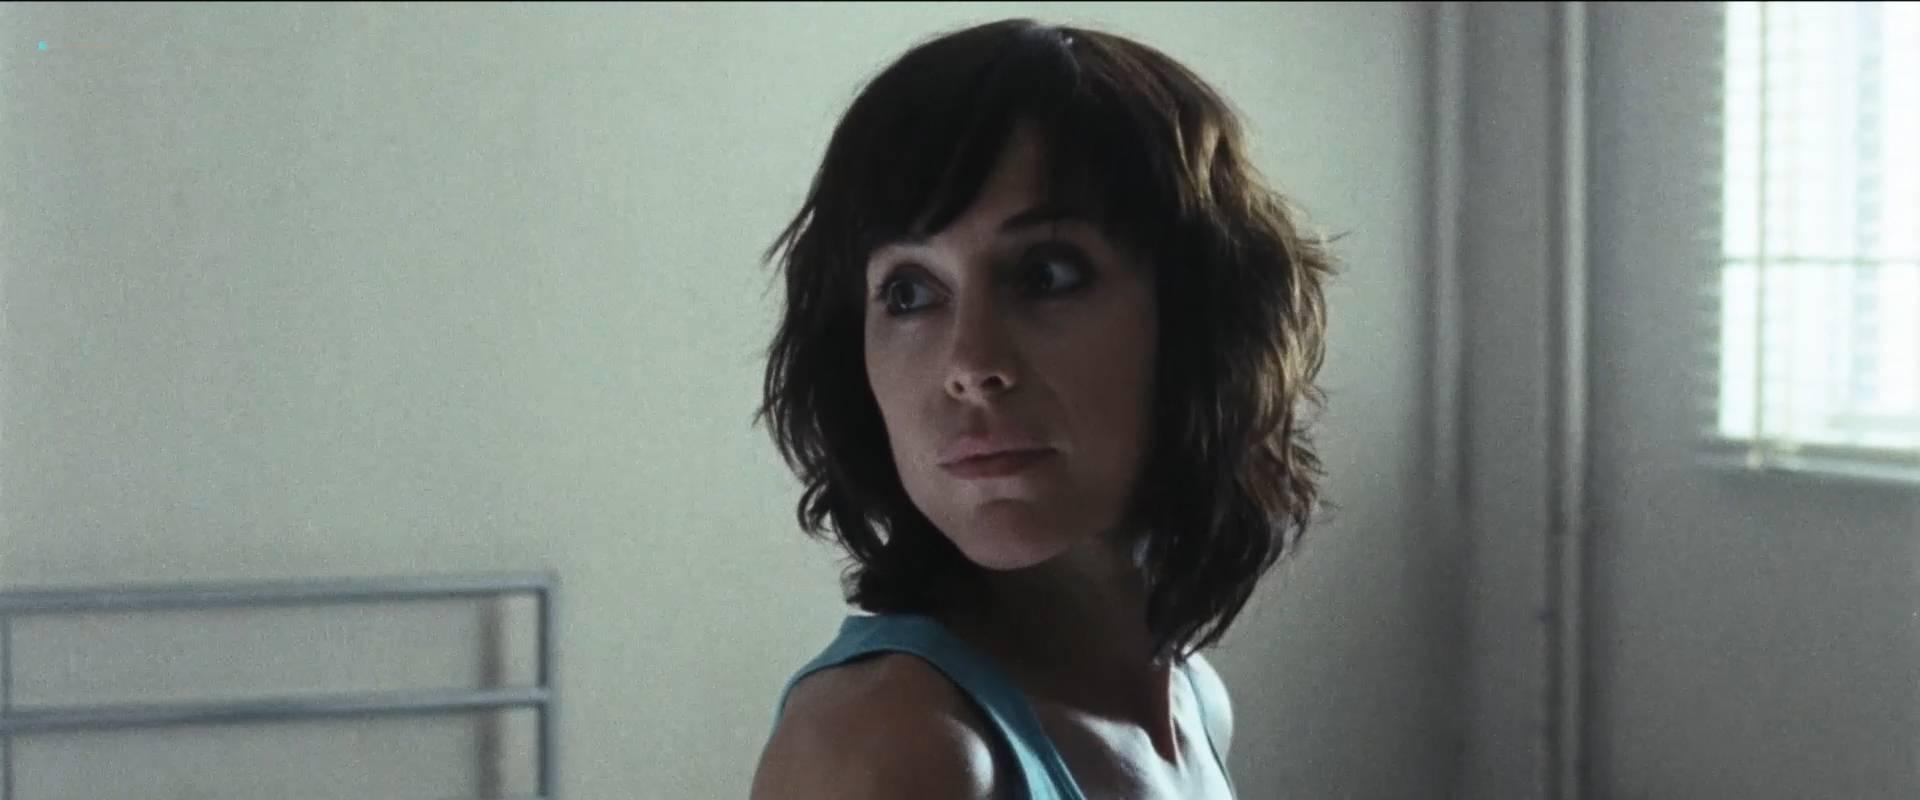 Ruth Díaz nude topless and sex - Tarde Para La Ira (ES -2016) HD 1080p BluRay (15)